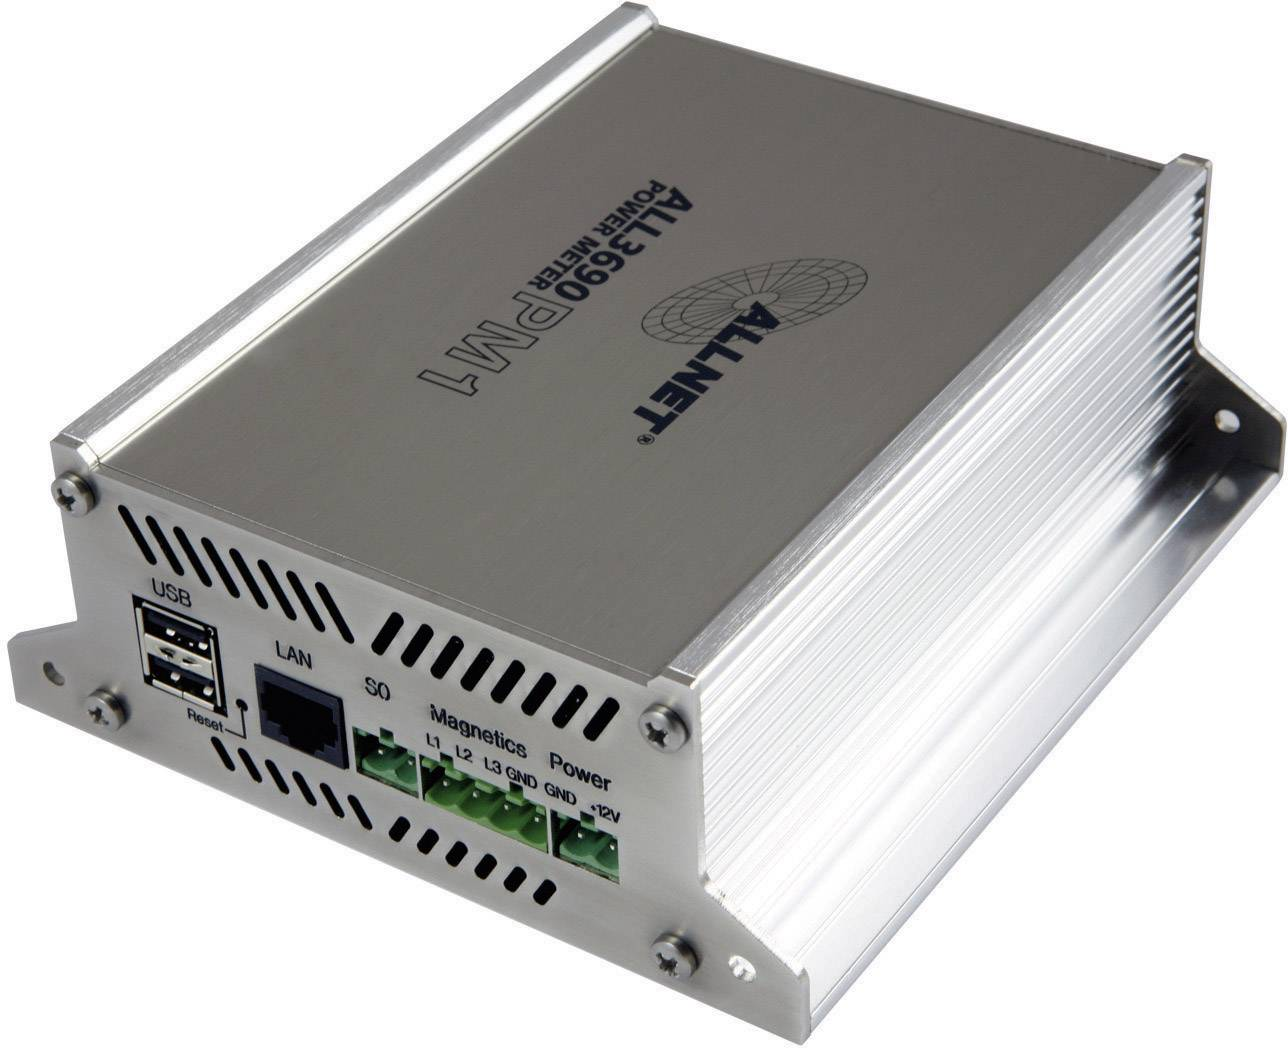 BG HU FI DE NL Energiekosten-Messgeräte-Set smappee AT LU